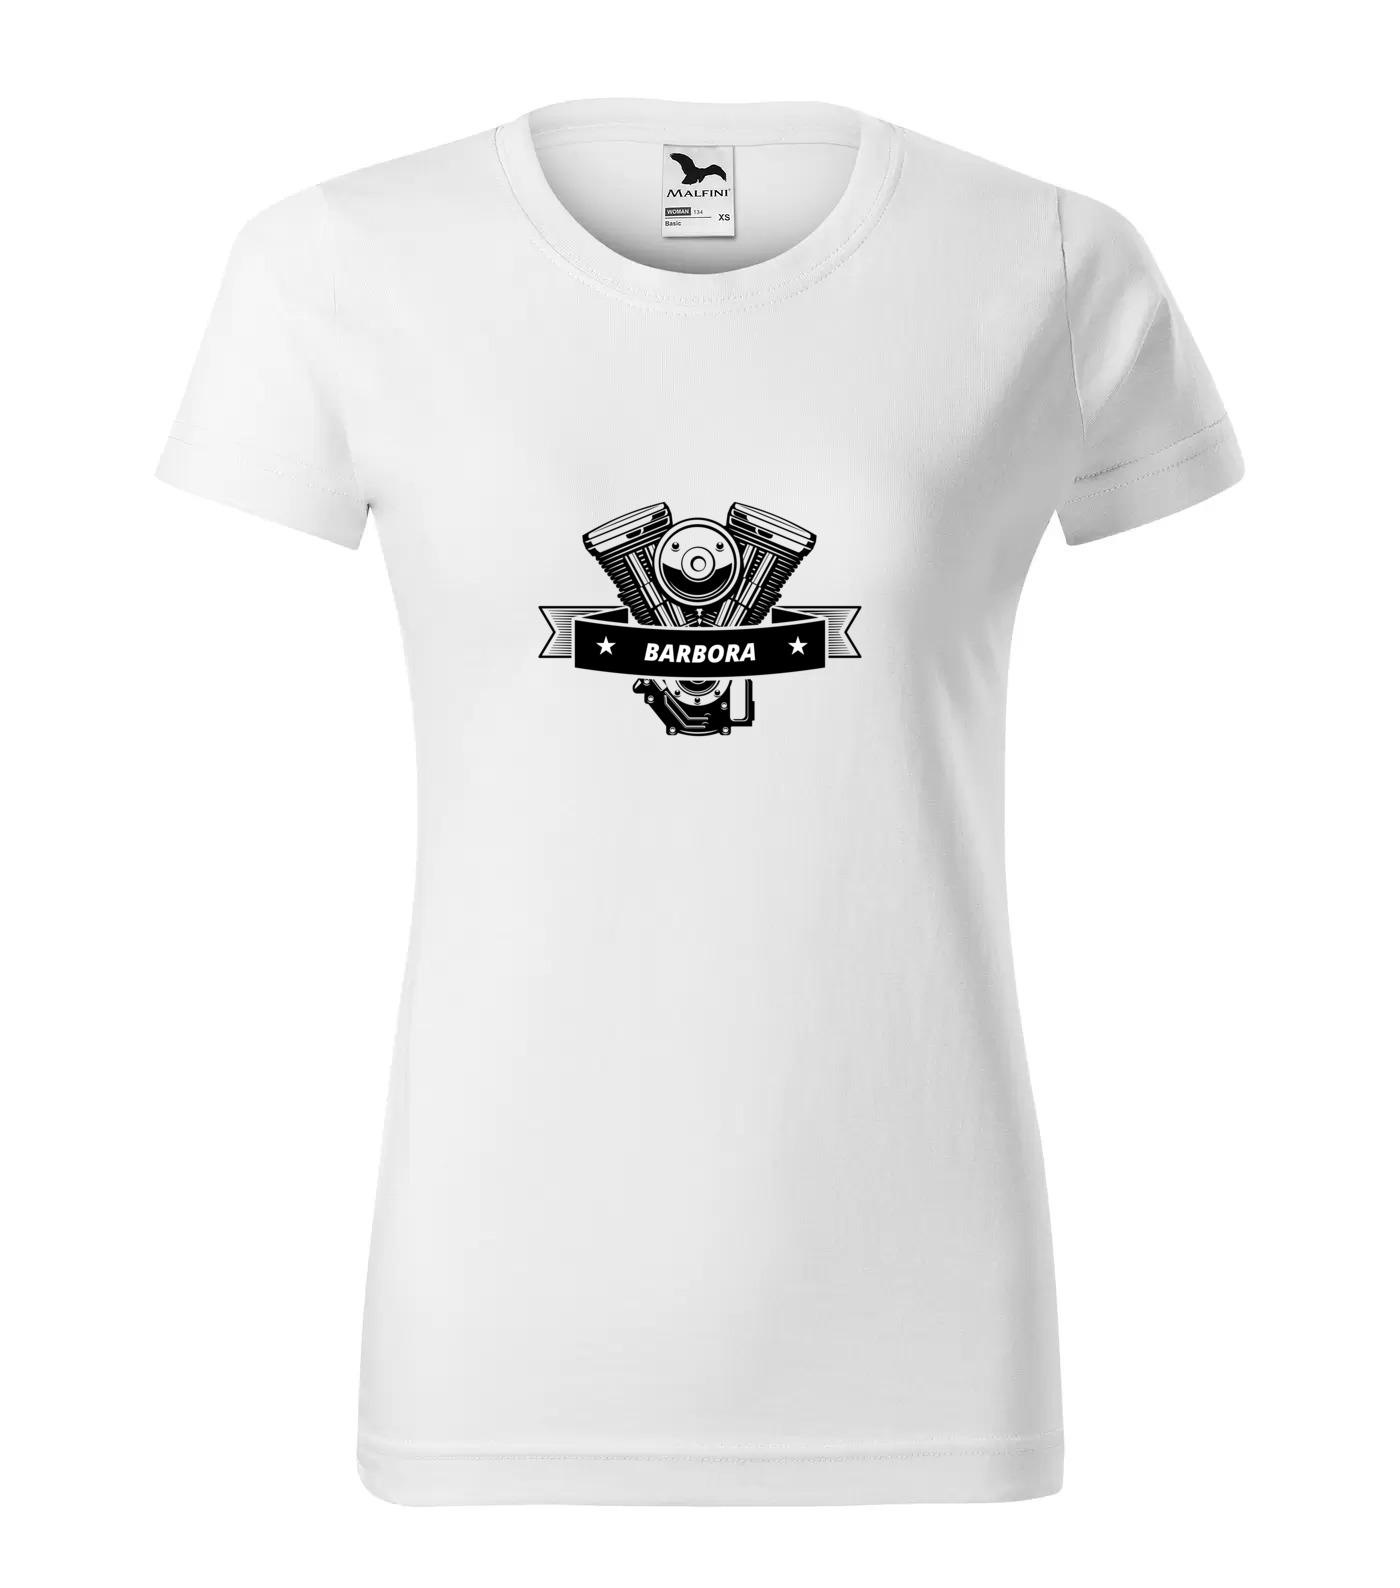 Tričko Motorkářka Barbora